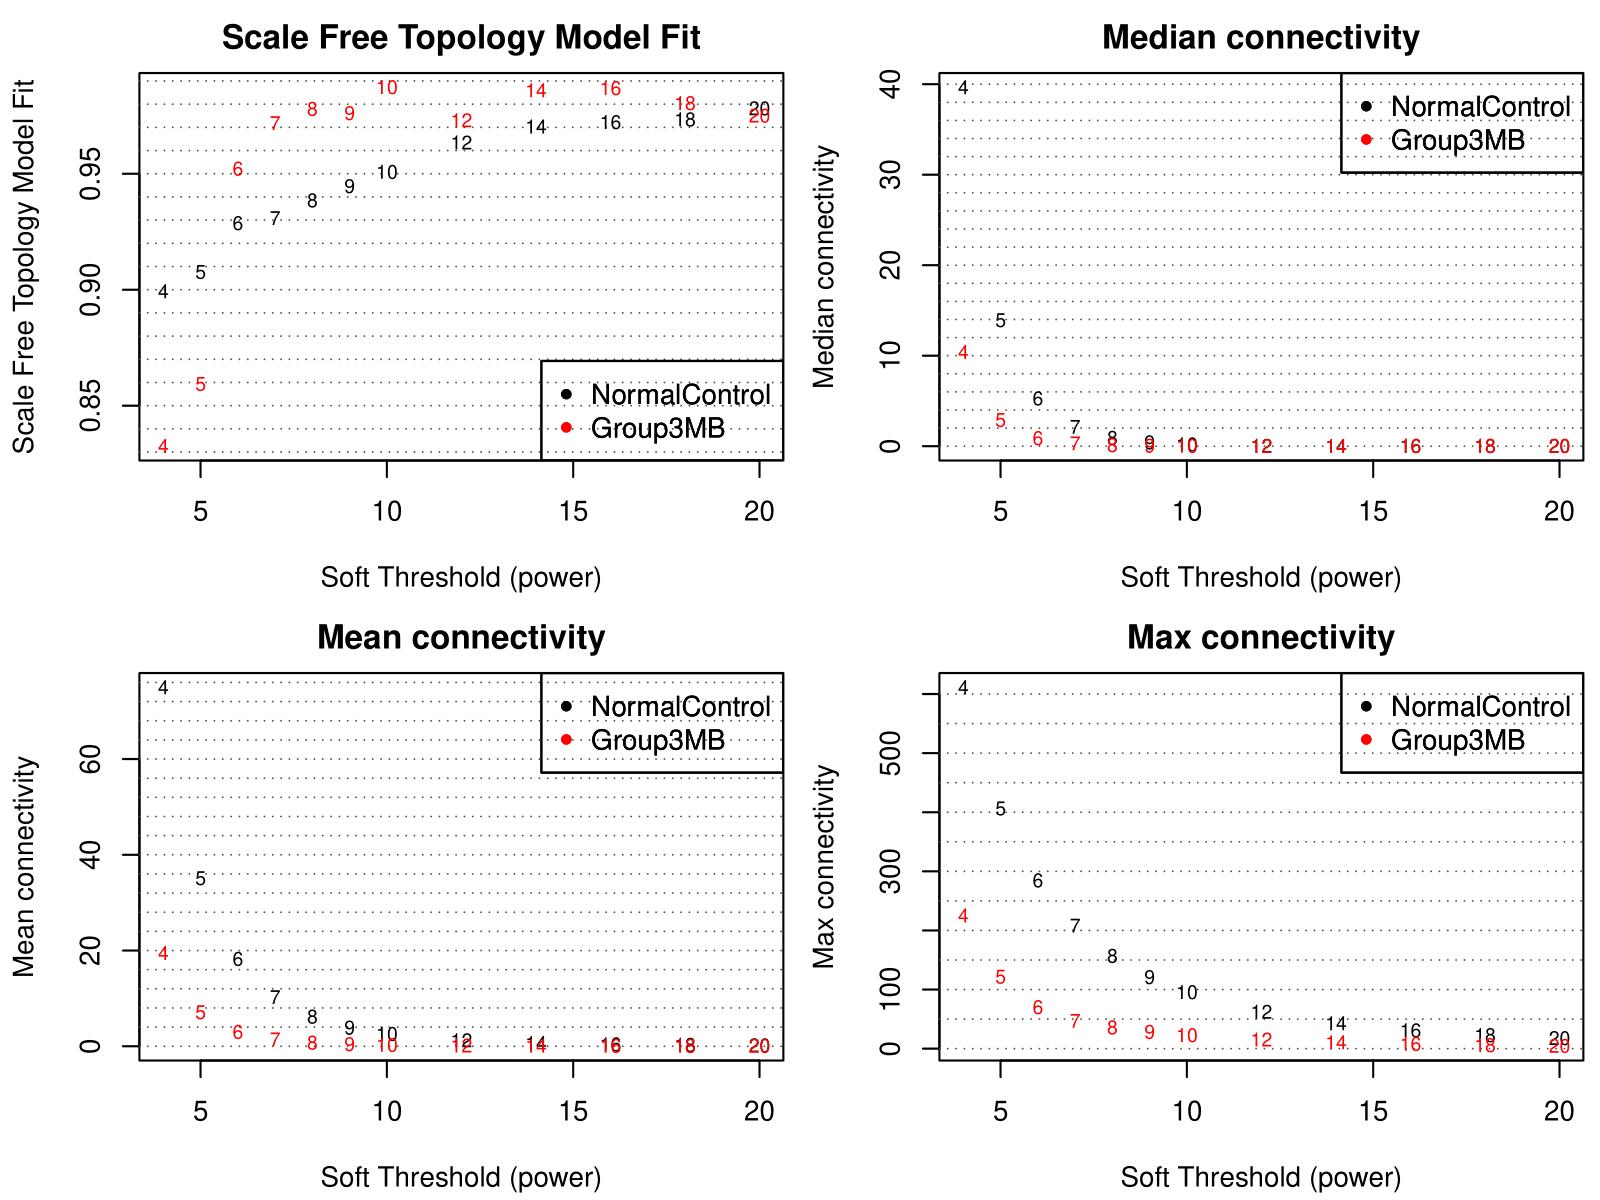 ScaleFreeAnalysis